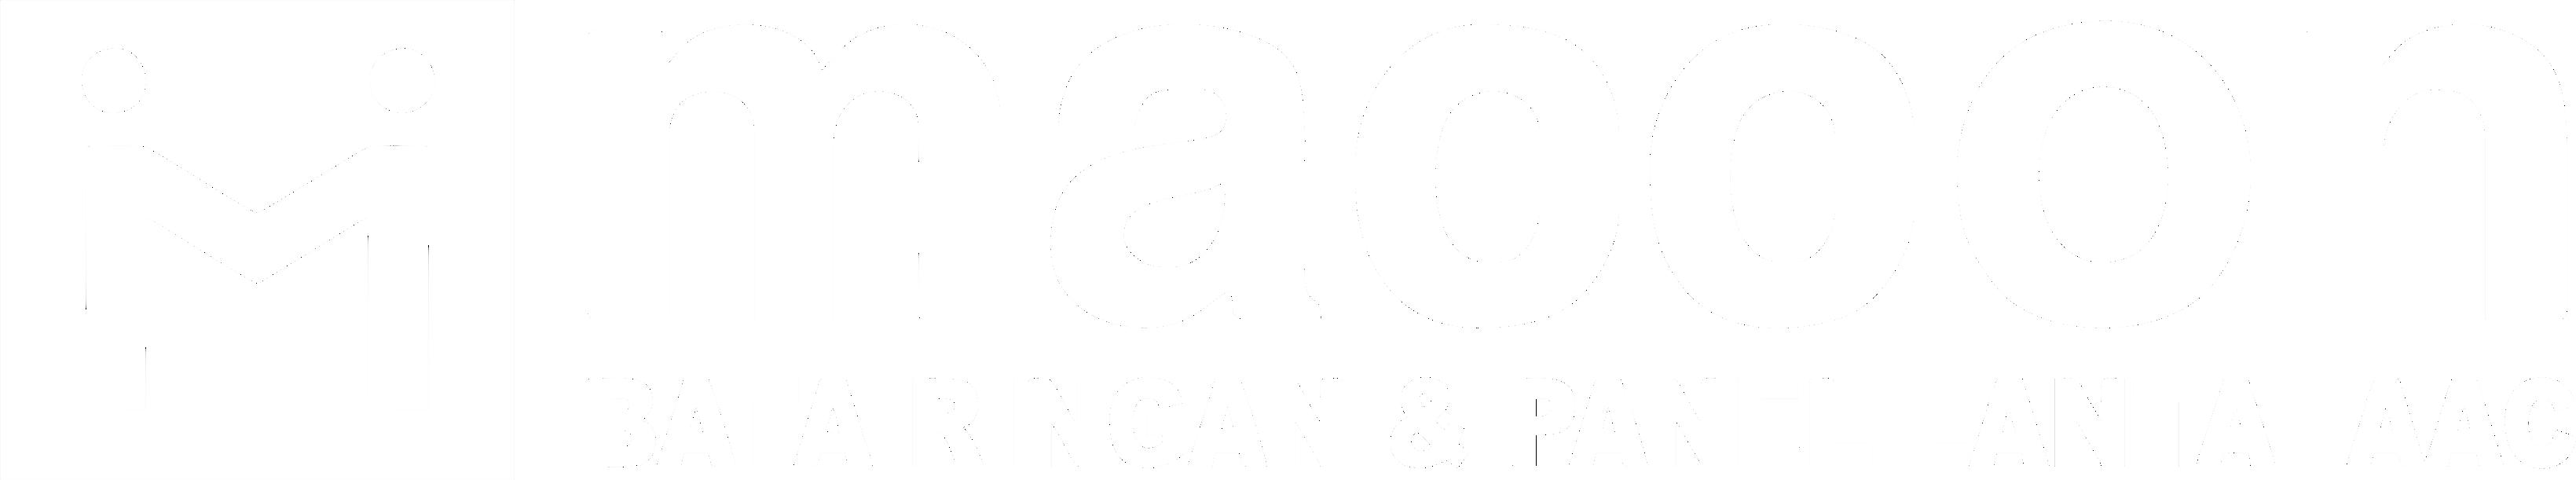 Kontak Maccon Bata Ringan Dan Panel Lantai Aac